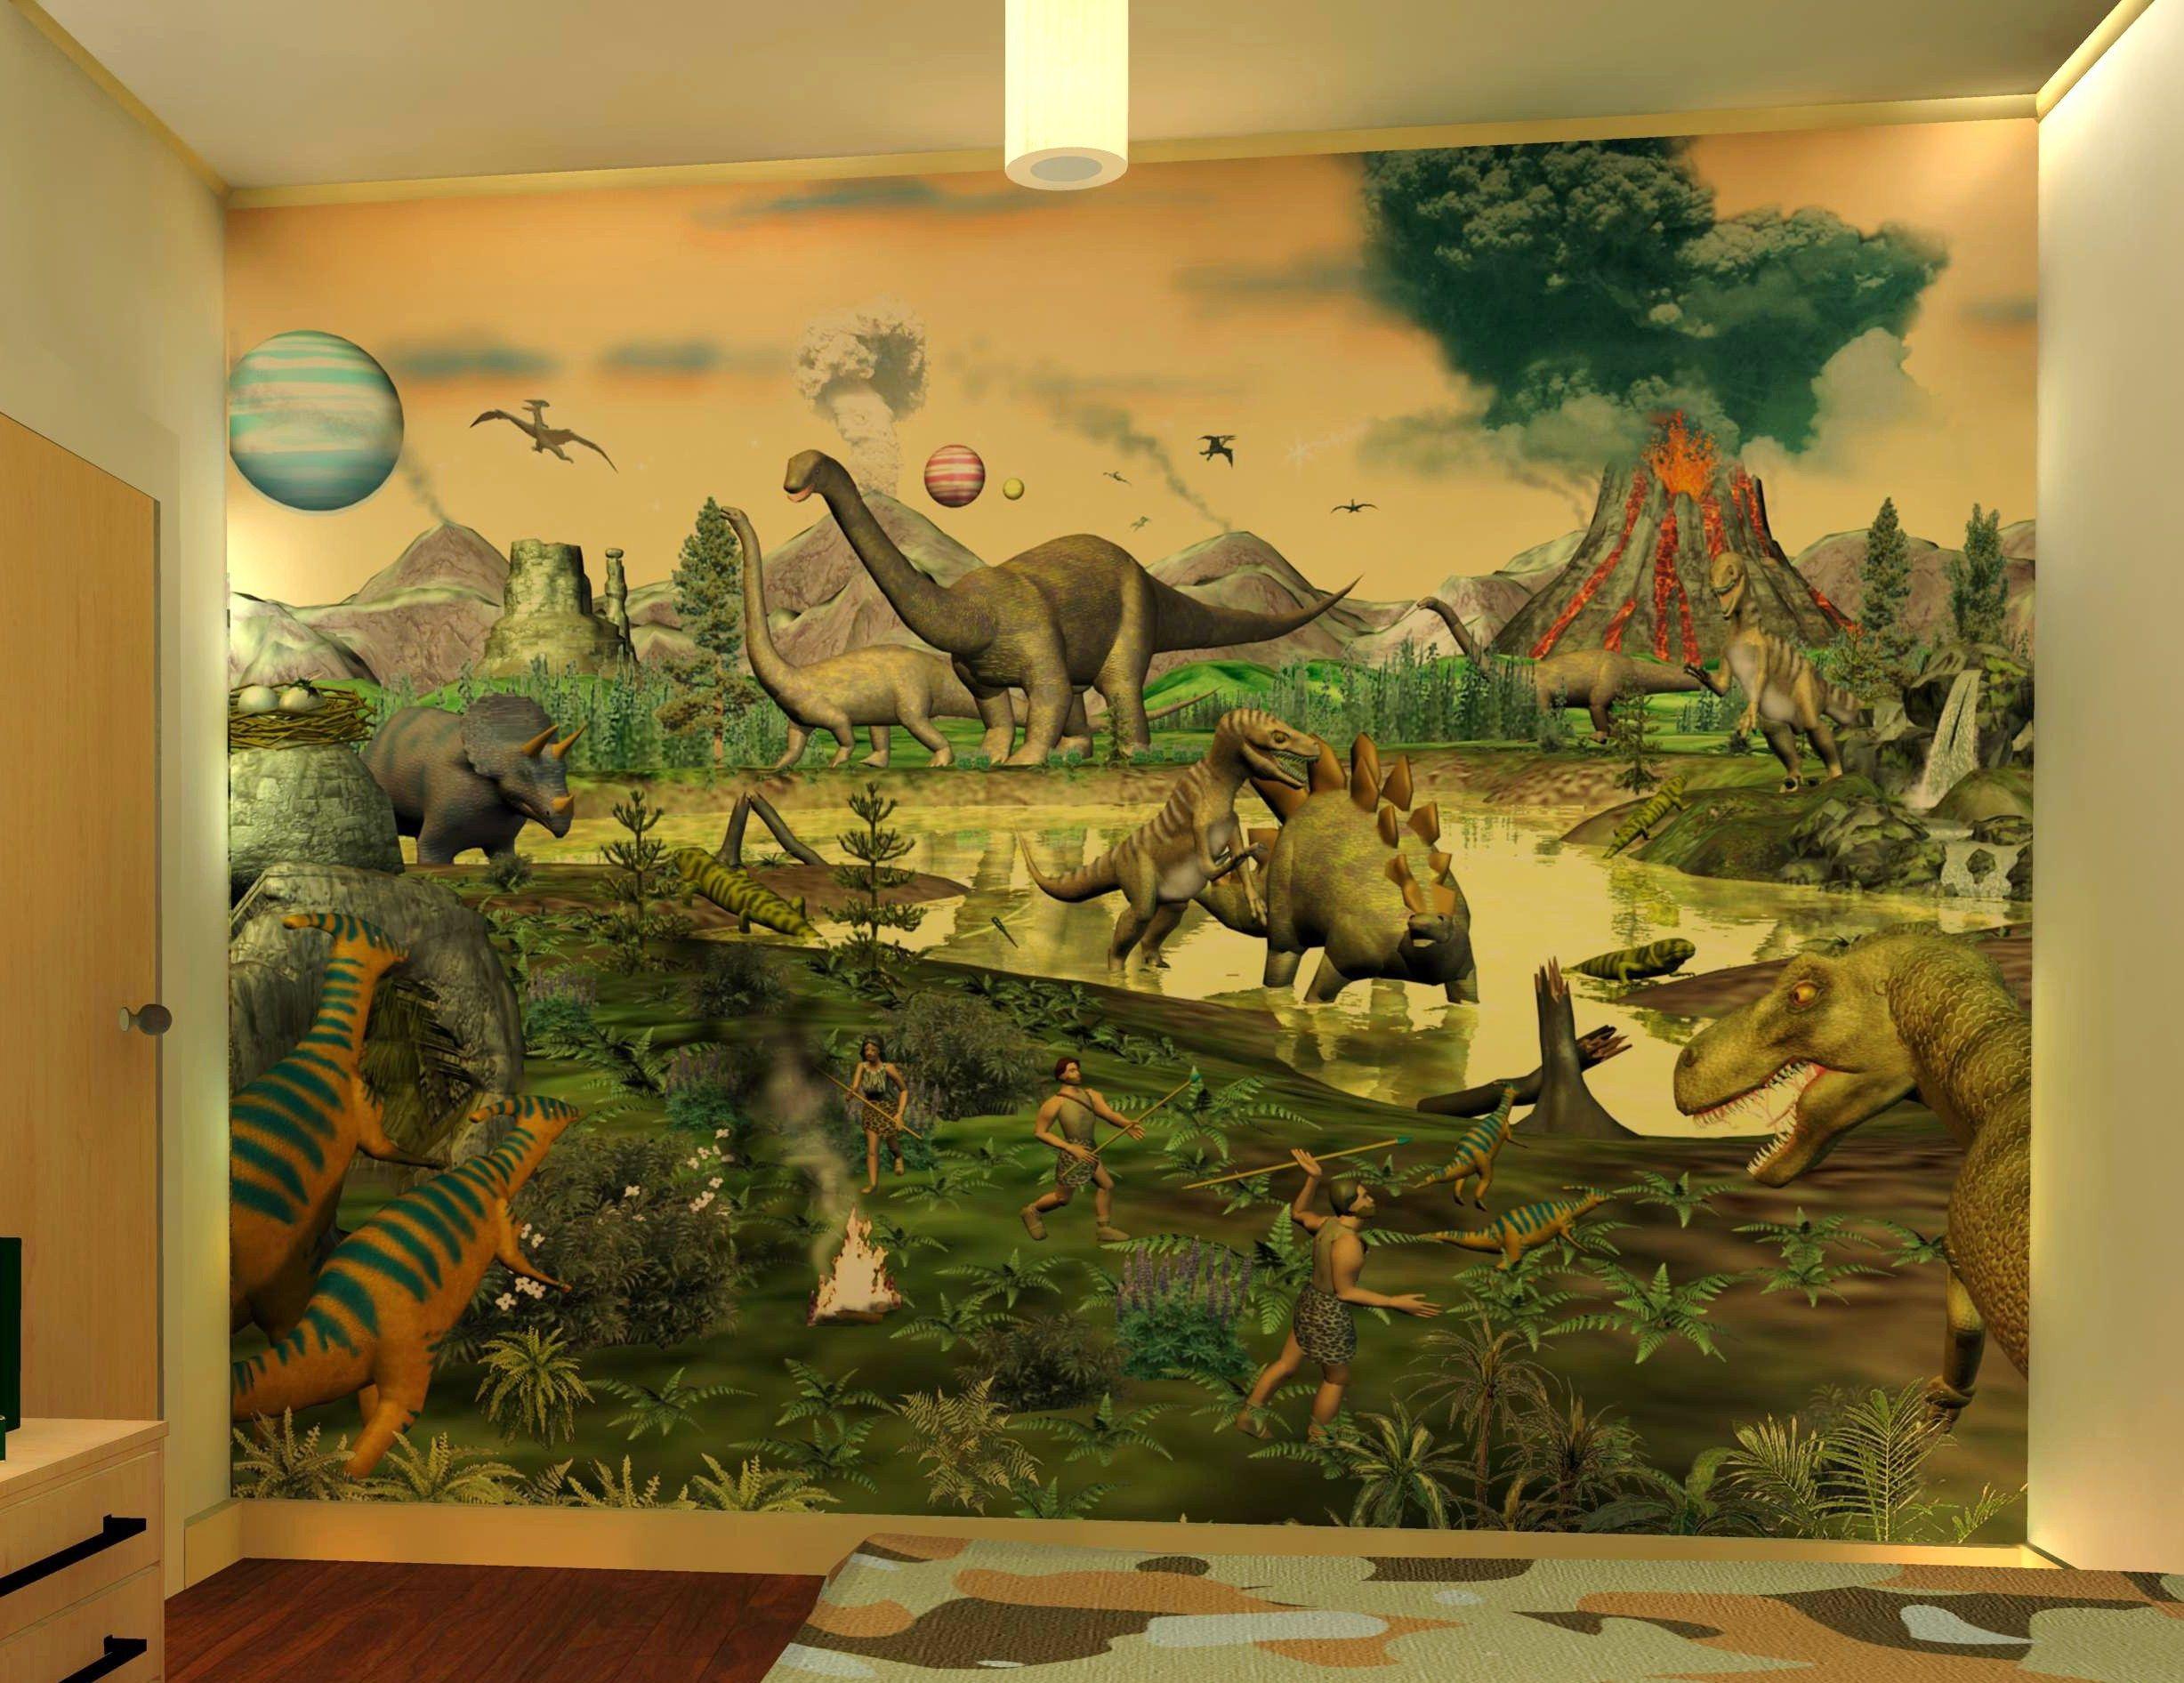 wall sticker mural | Dinosaur Planets Toddler Room | Pinterest ...